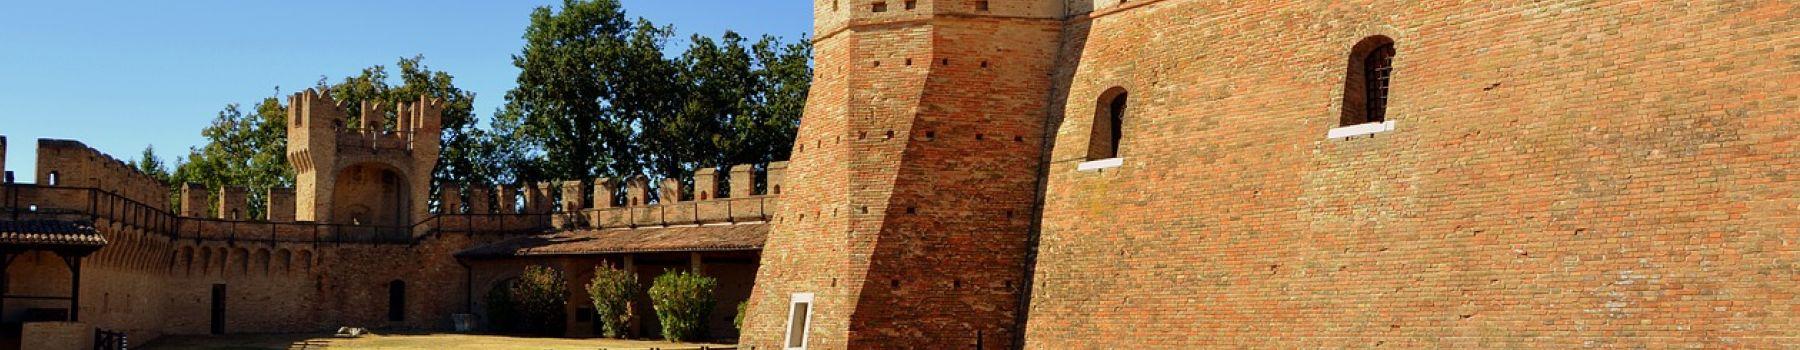 Bonelli BUS: da Rimini, Riccione, Cattolica a Gradara | Bonelli Bus